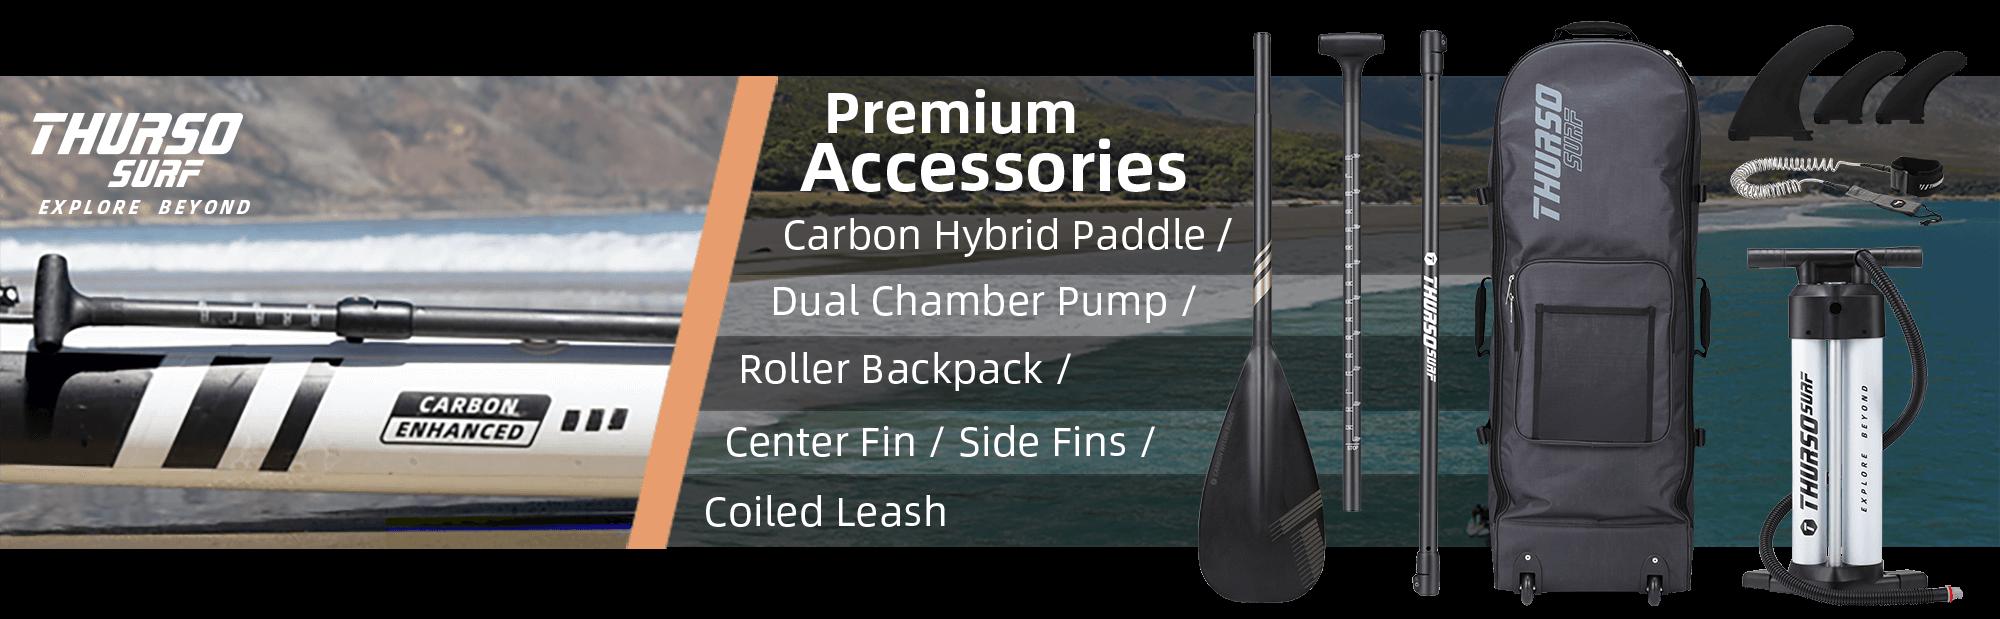 thurso surf 2021 SUP accessories